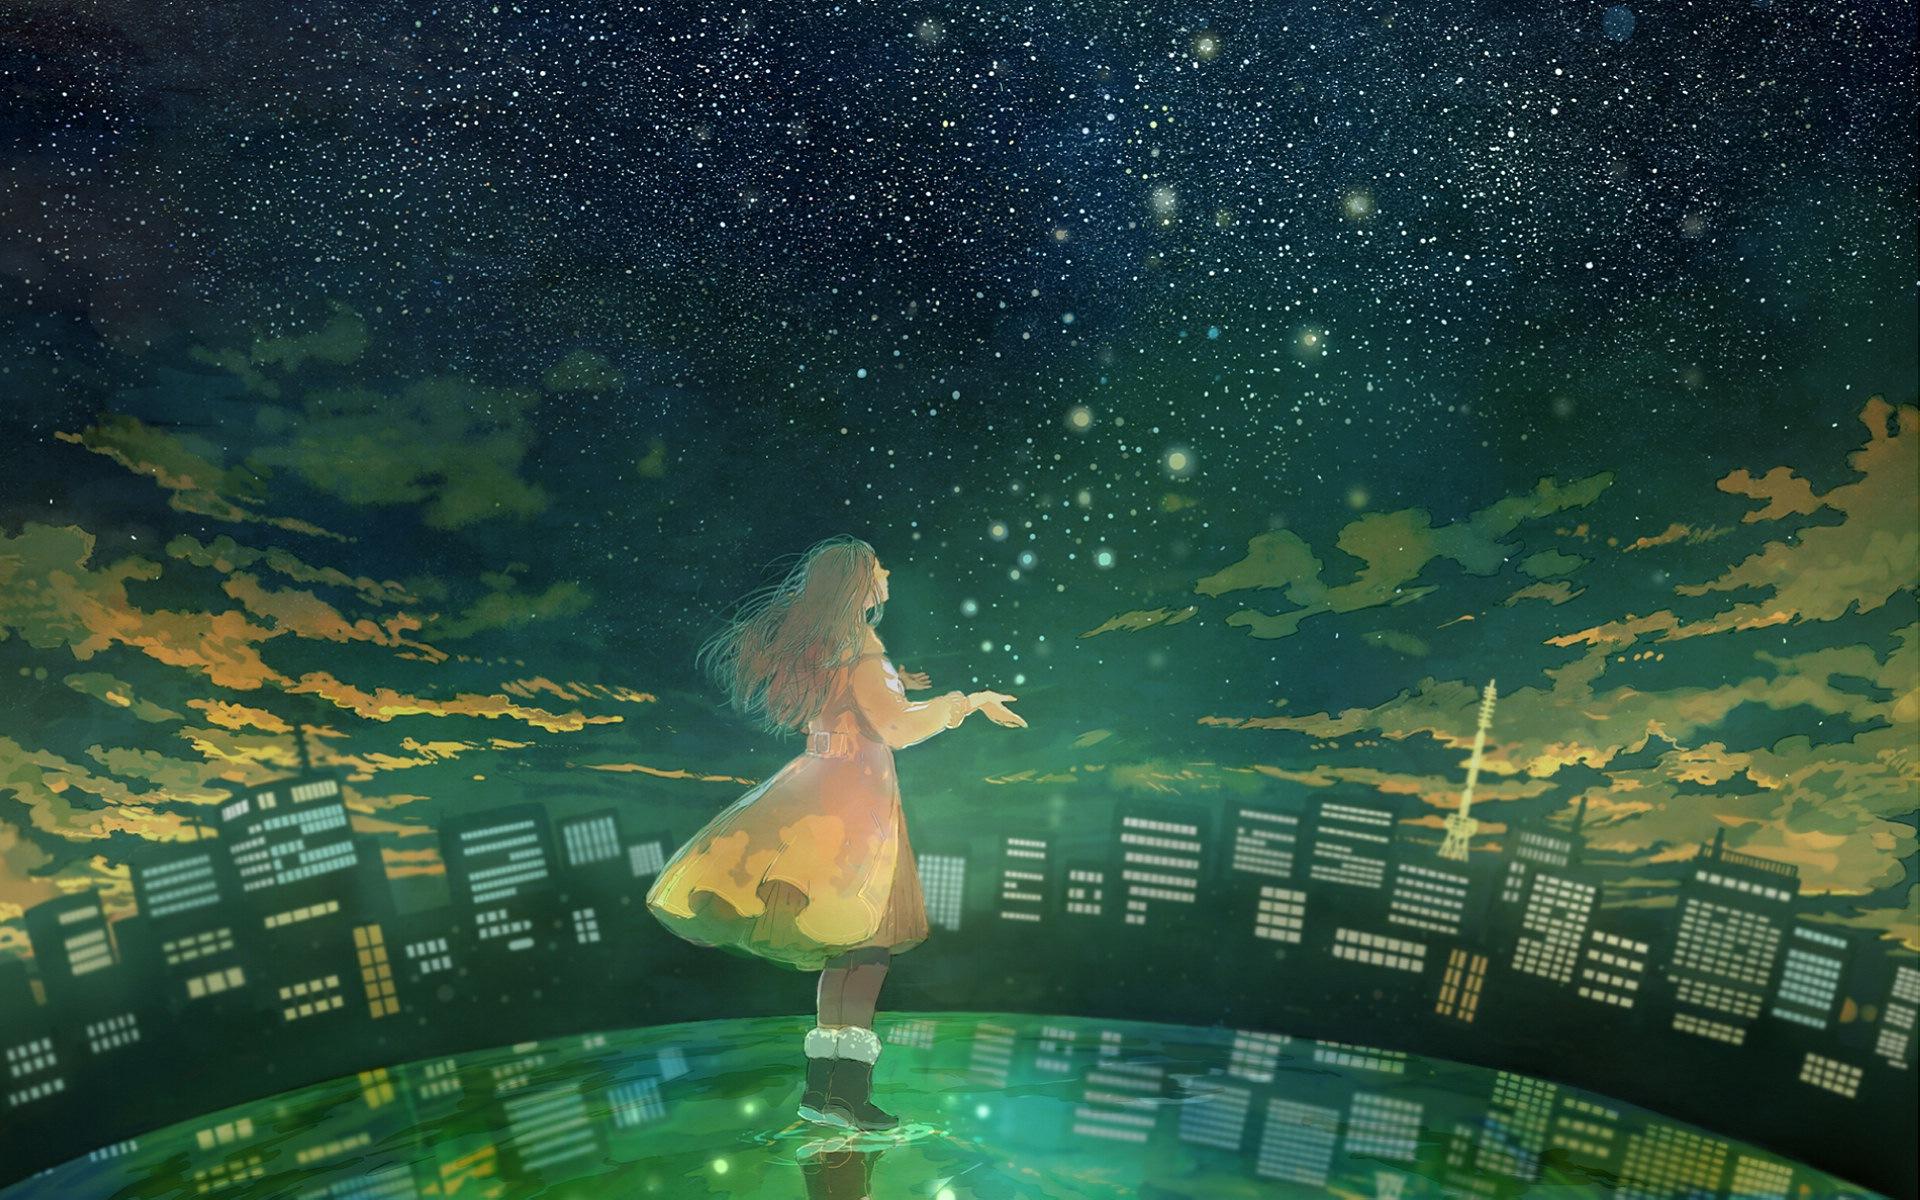 Firefly Summer Beautiful Anime Wallpaper Fireflies Wallpaper Anime 1920x1200 Wallpaper Teahub Io